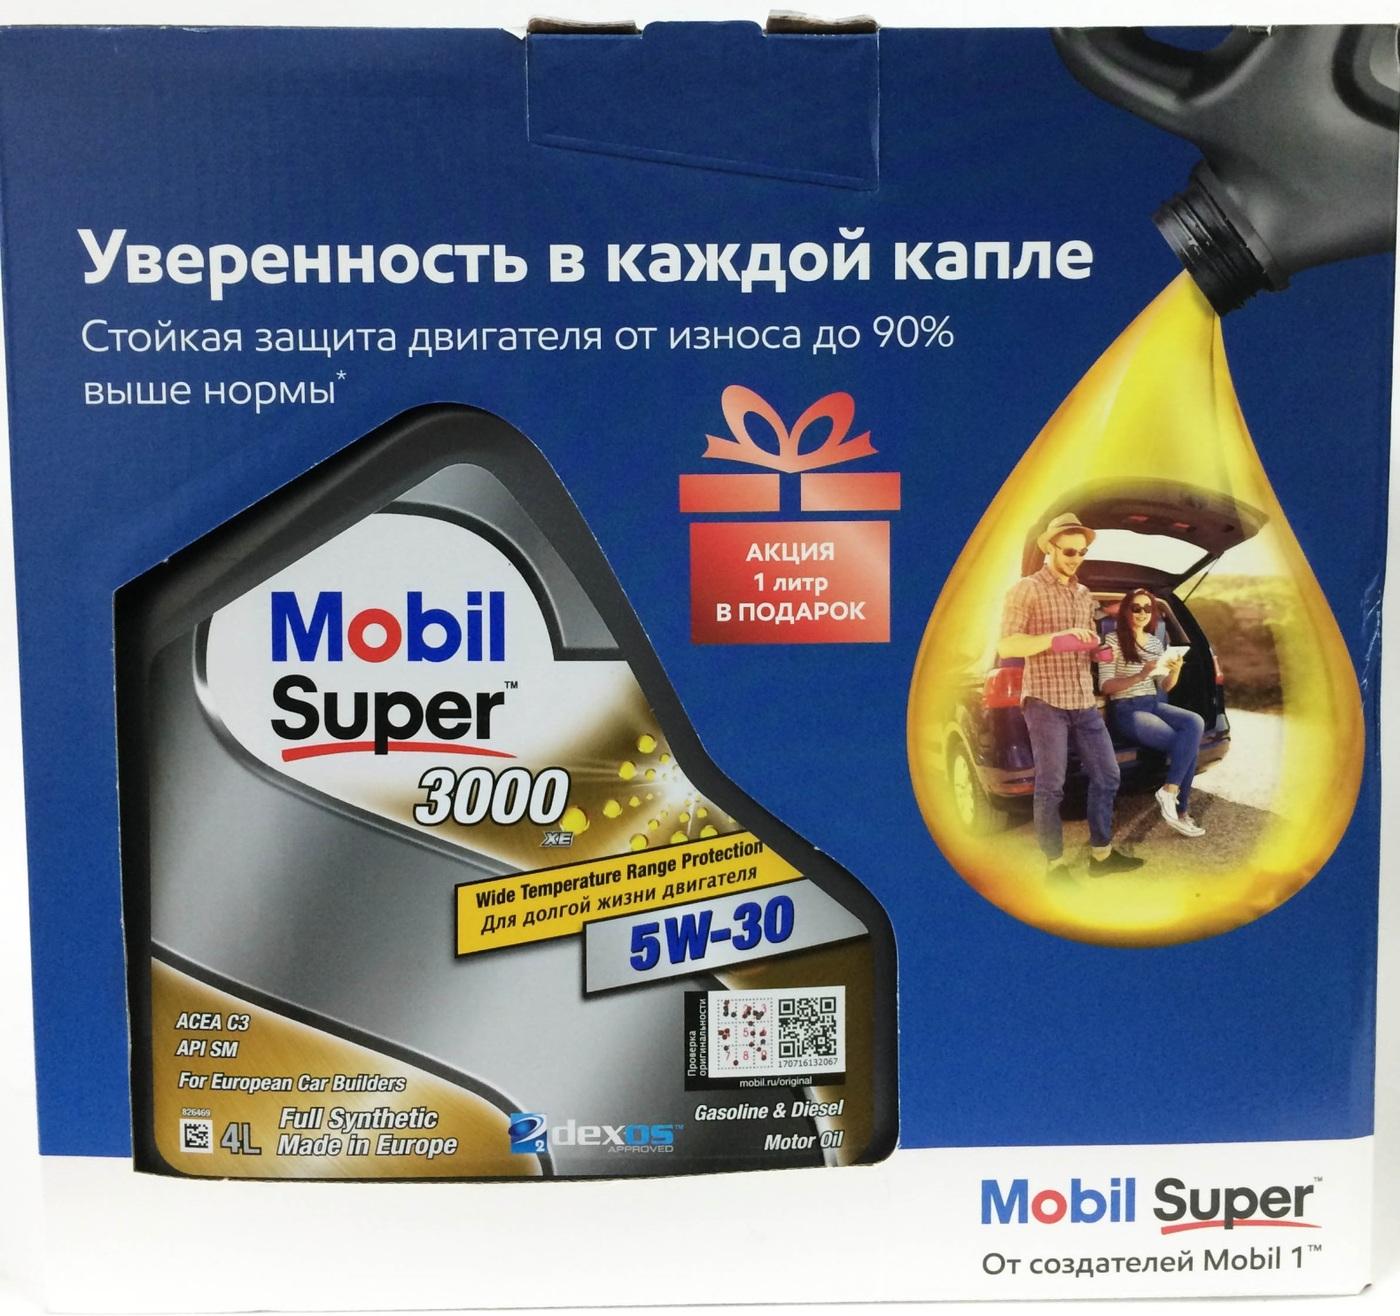 MOBIL Моторное масло Super 3000 XE SAE 5w30 Подарочный набор 4л + 1л